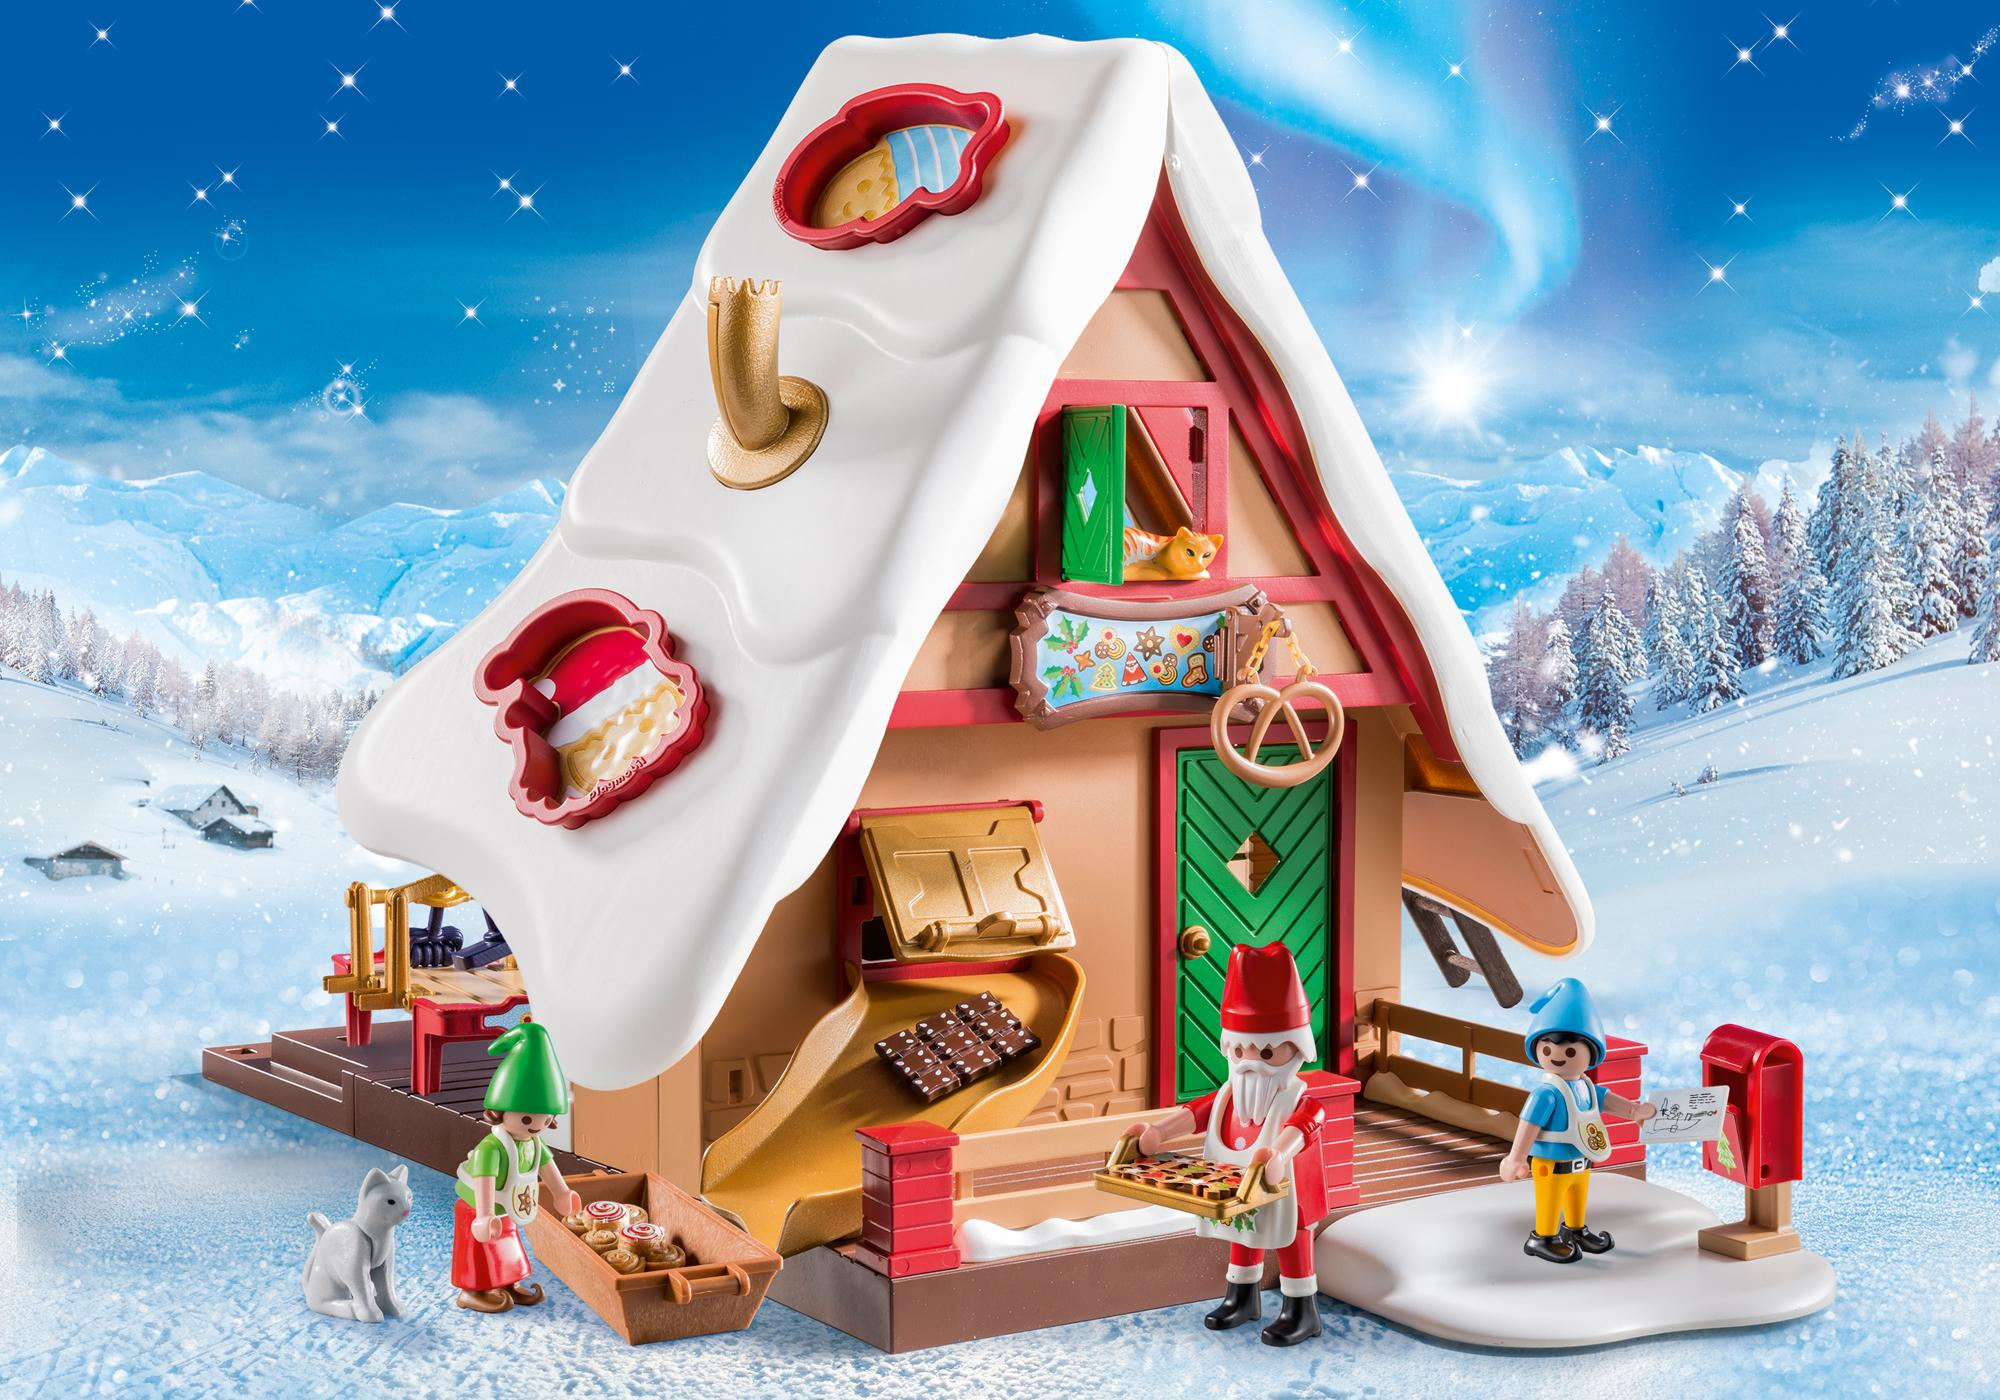 http://media.playmobil.com/i/playmobil/9493_product_detail/Julebageri med småkageskærere